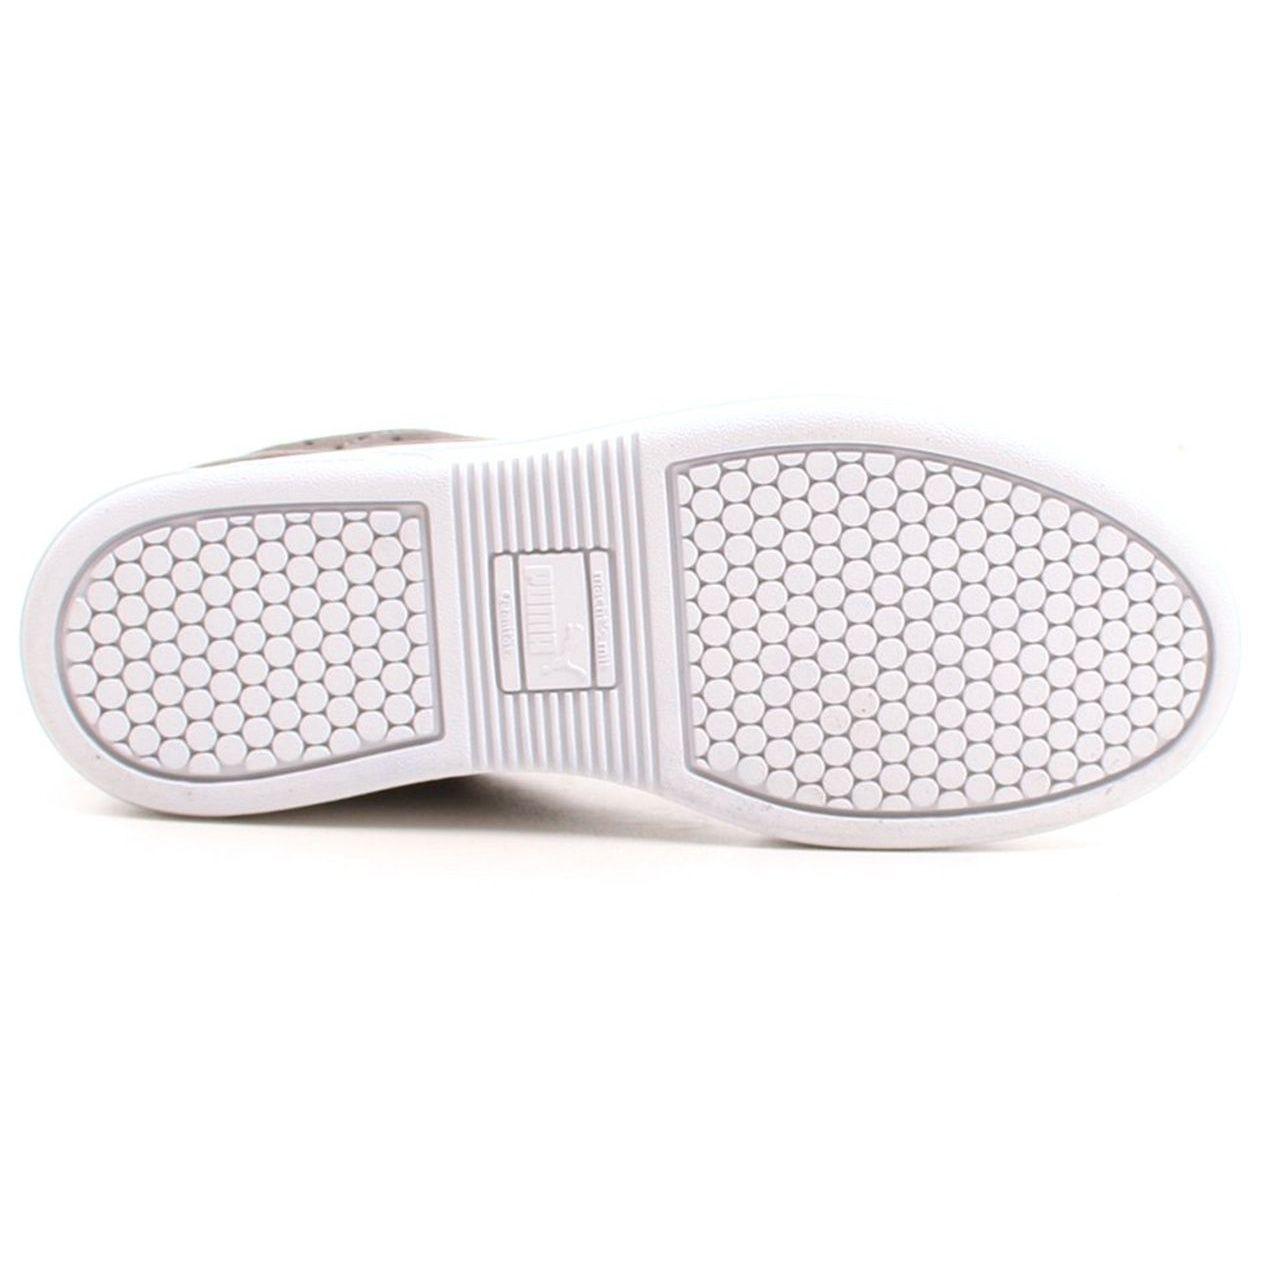 کفش راحتی مردانه پوما مدل Court Star Suede -  - 4